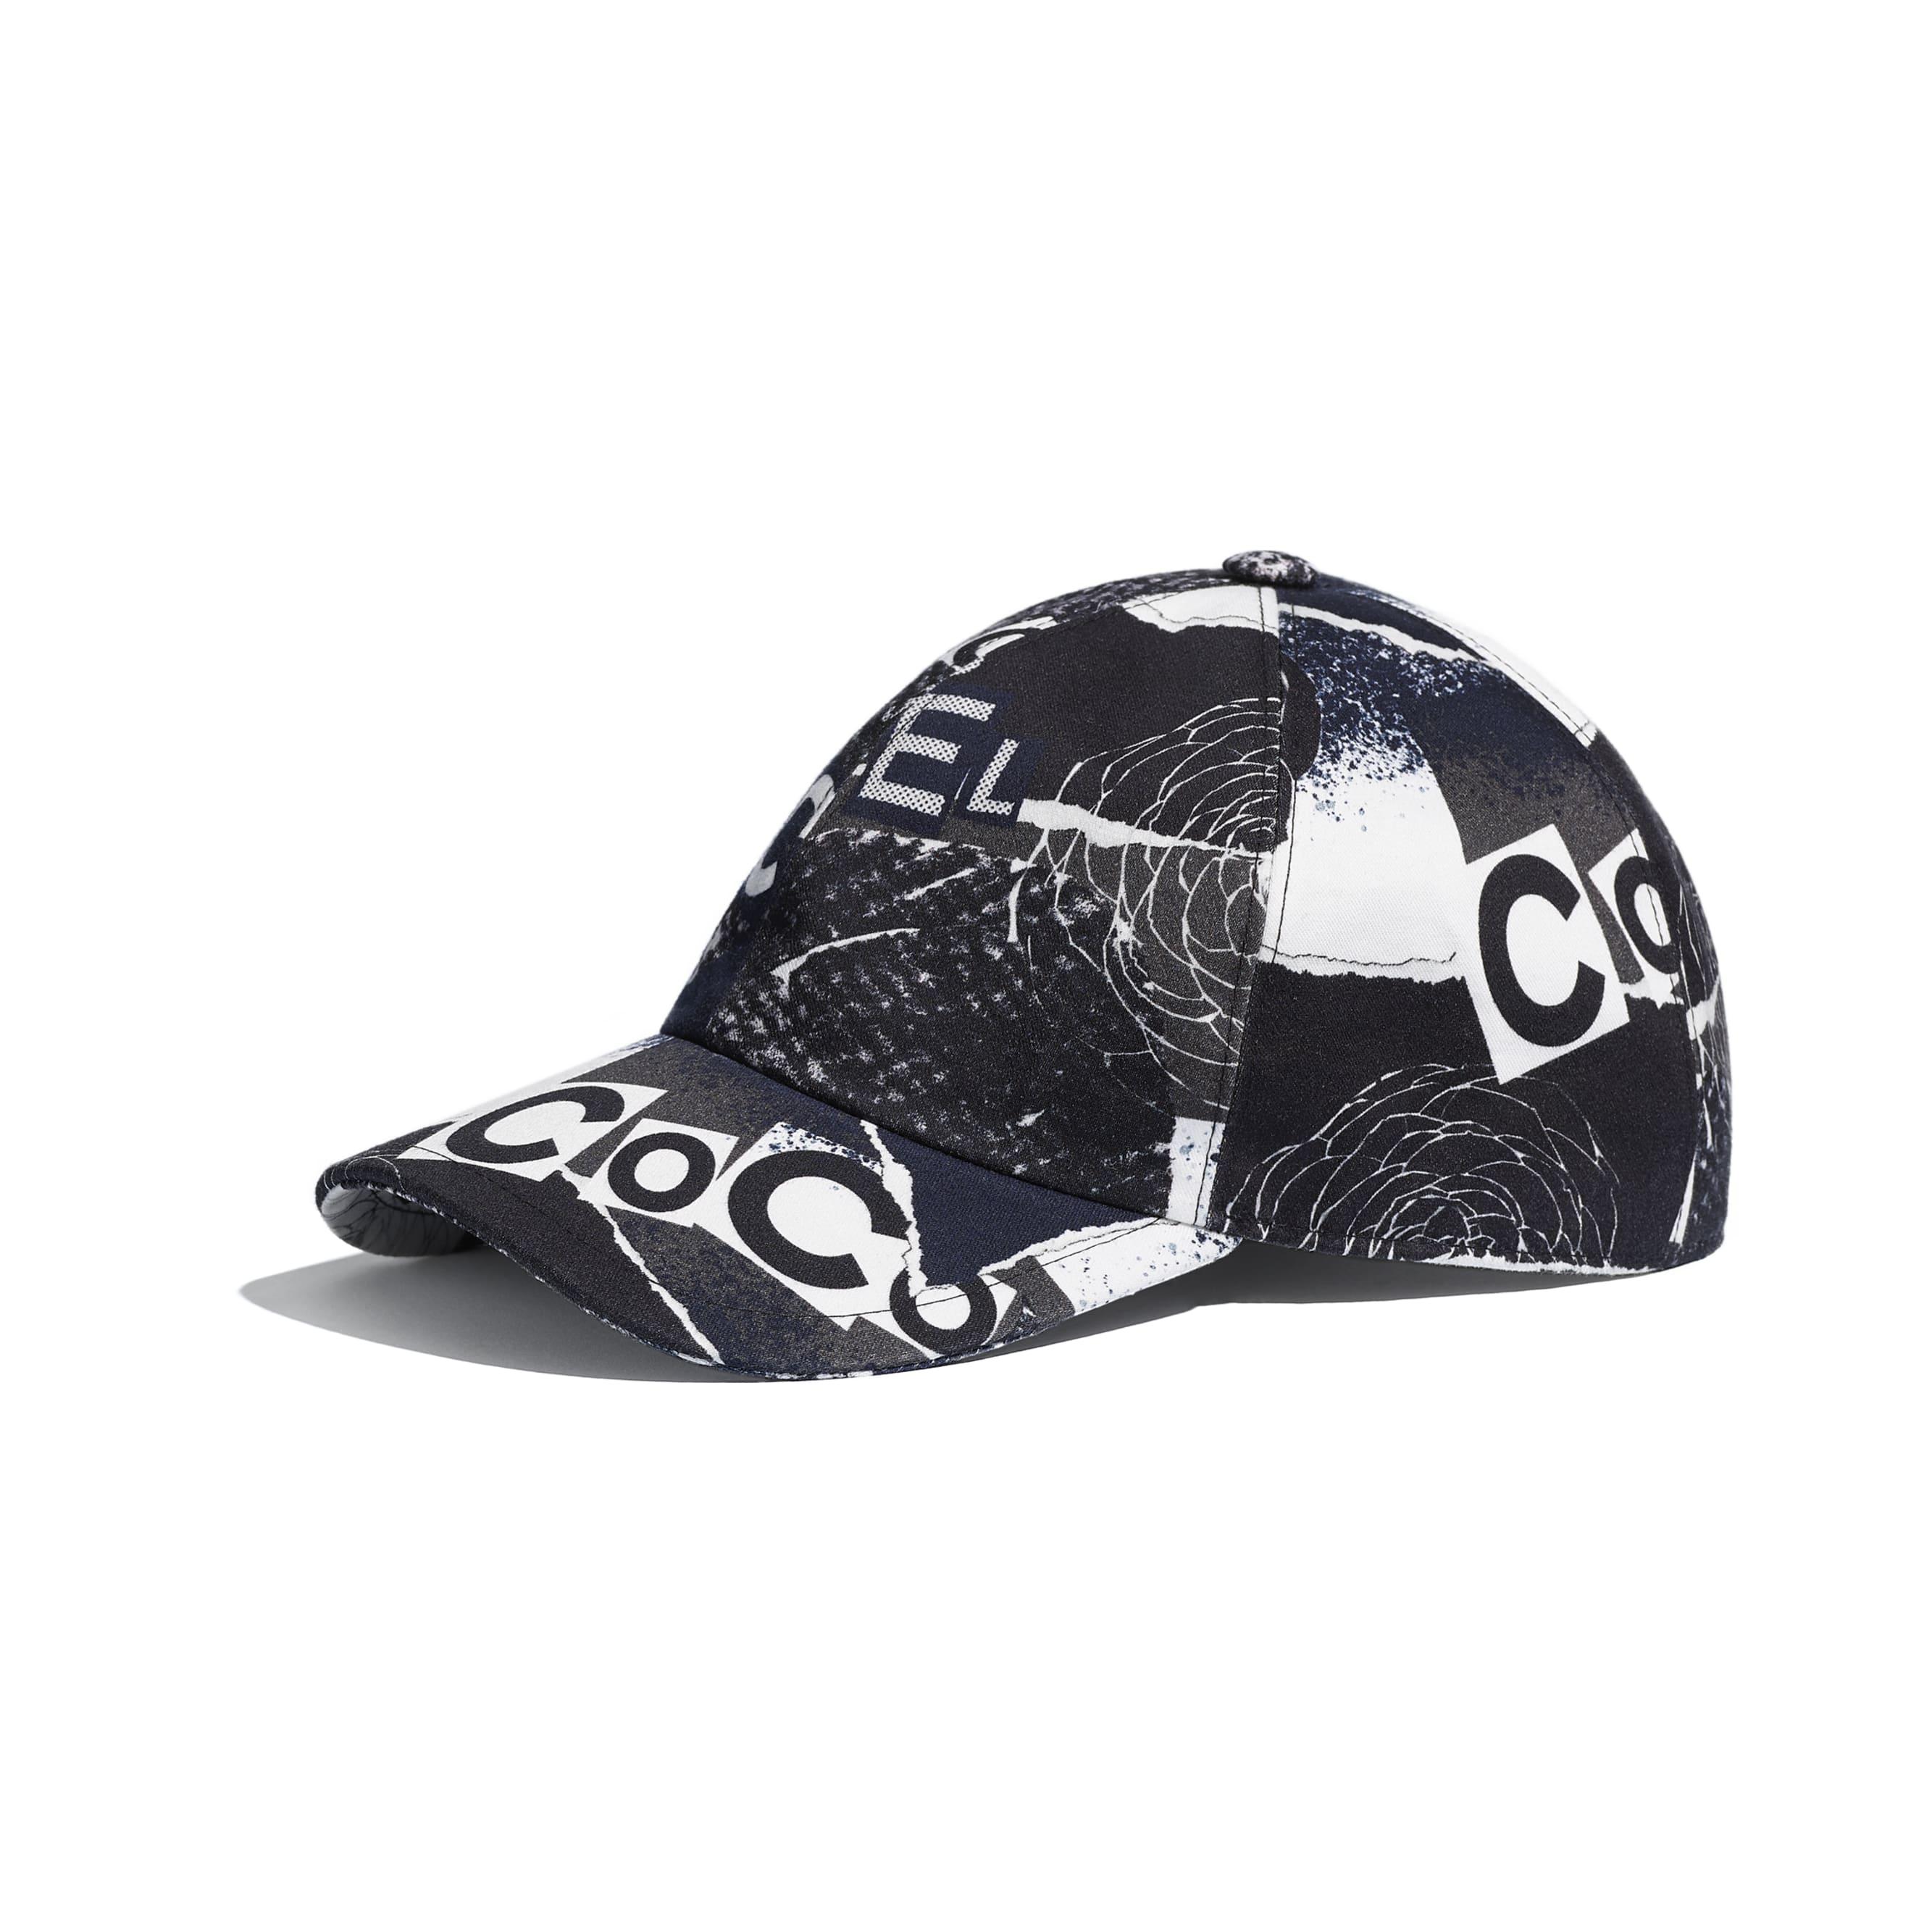 Cap - Navy Blue, White, Black & Grey - Cotton - CHANEL - Default view - see standard sized version